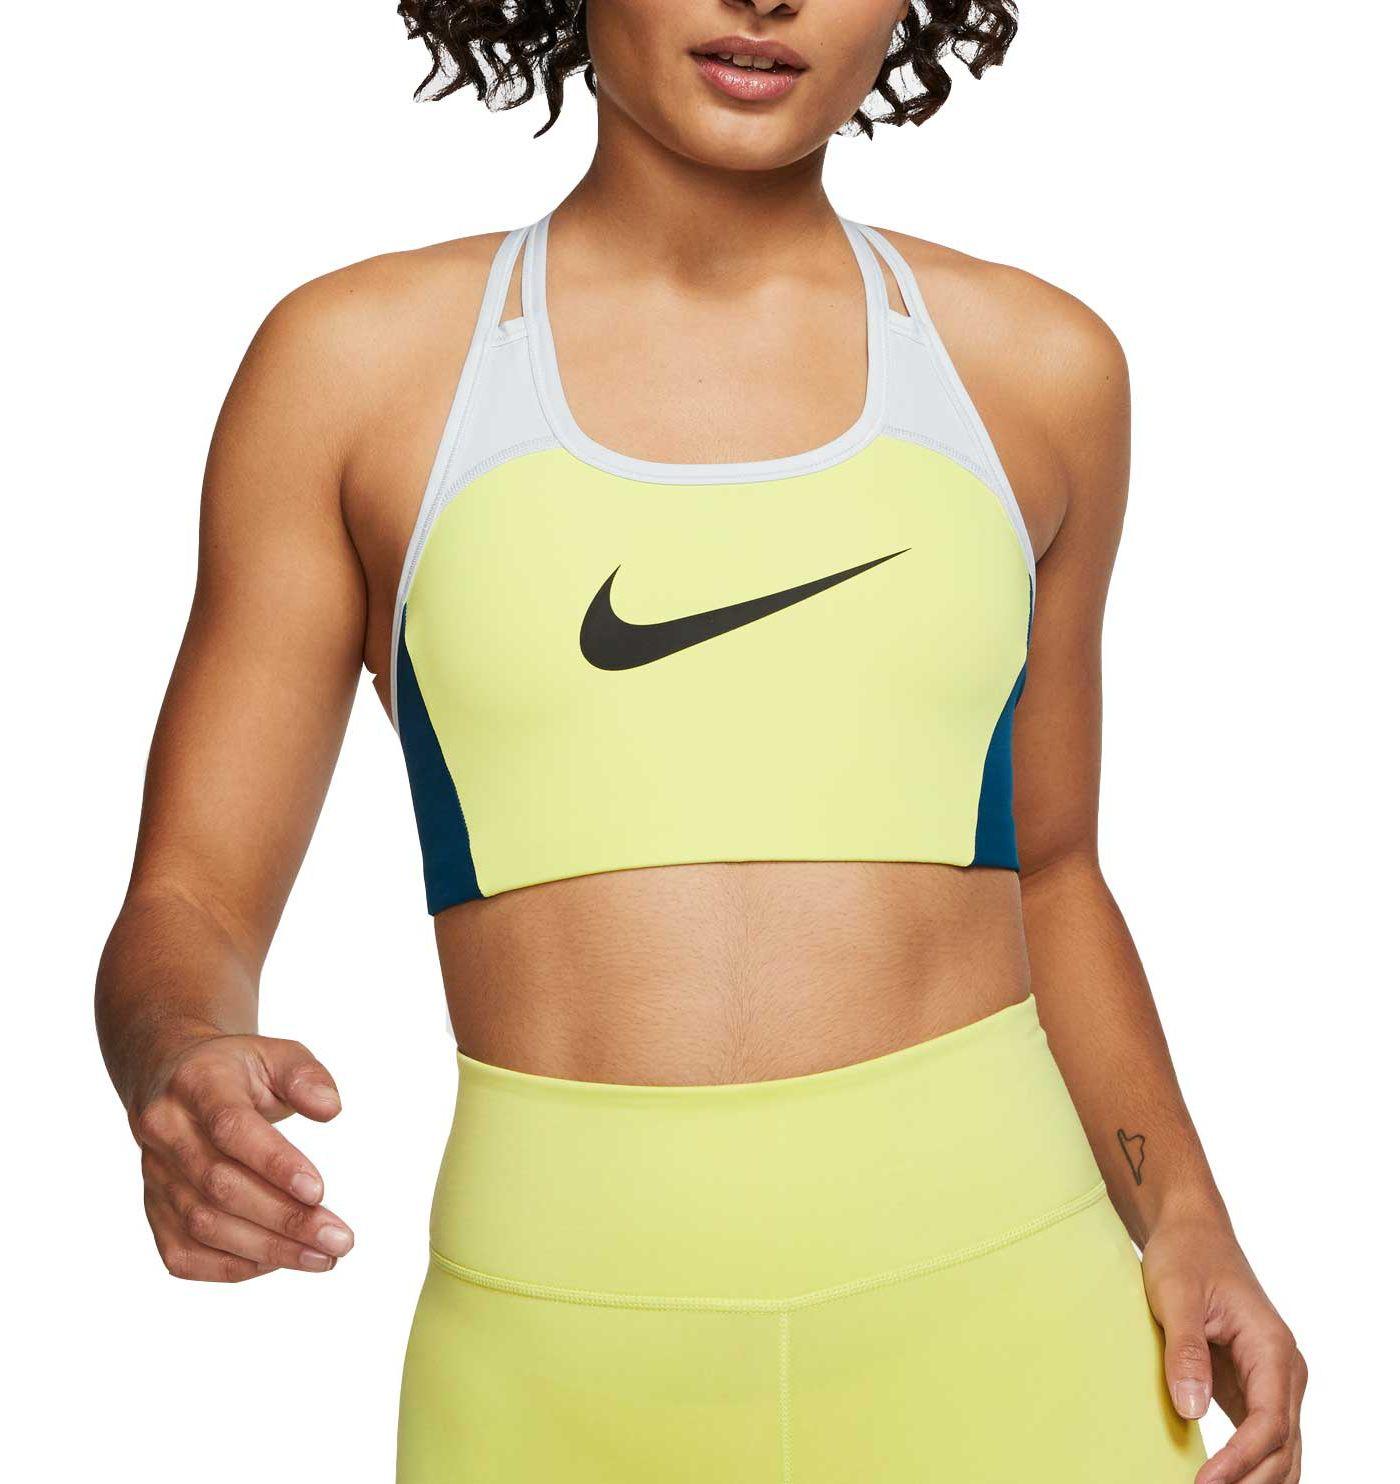 Nike Women's Swoosh Colorblock Medium Support Sports Bra